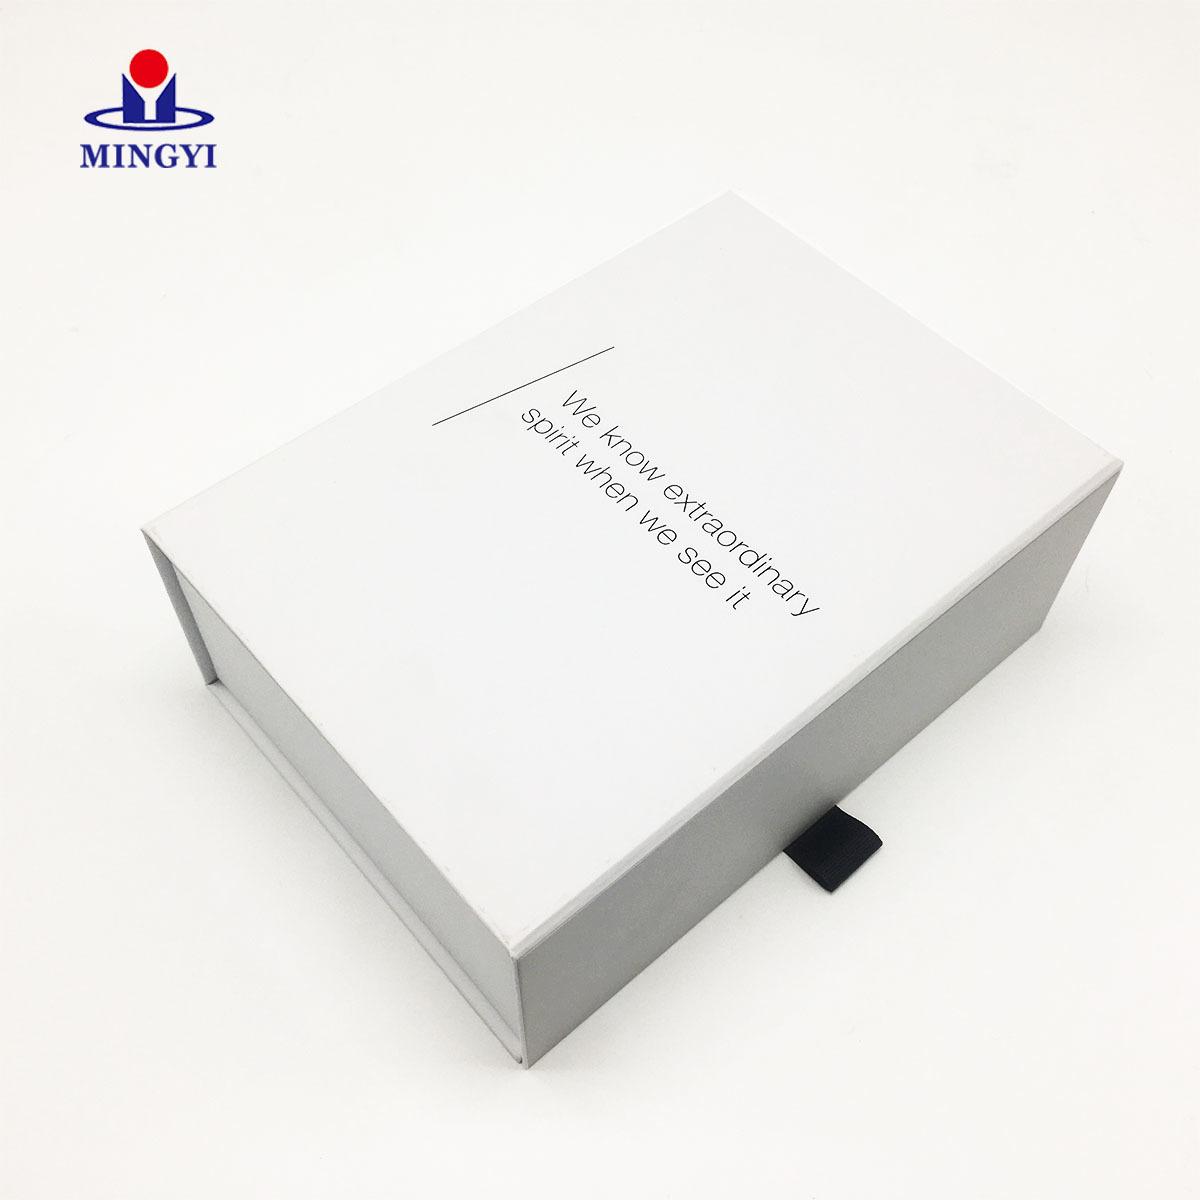 Hot hard gift boxes superior Mingyi Printing Brand